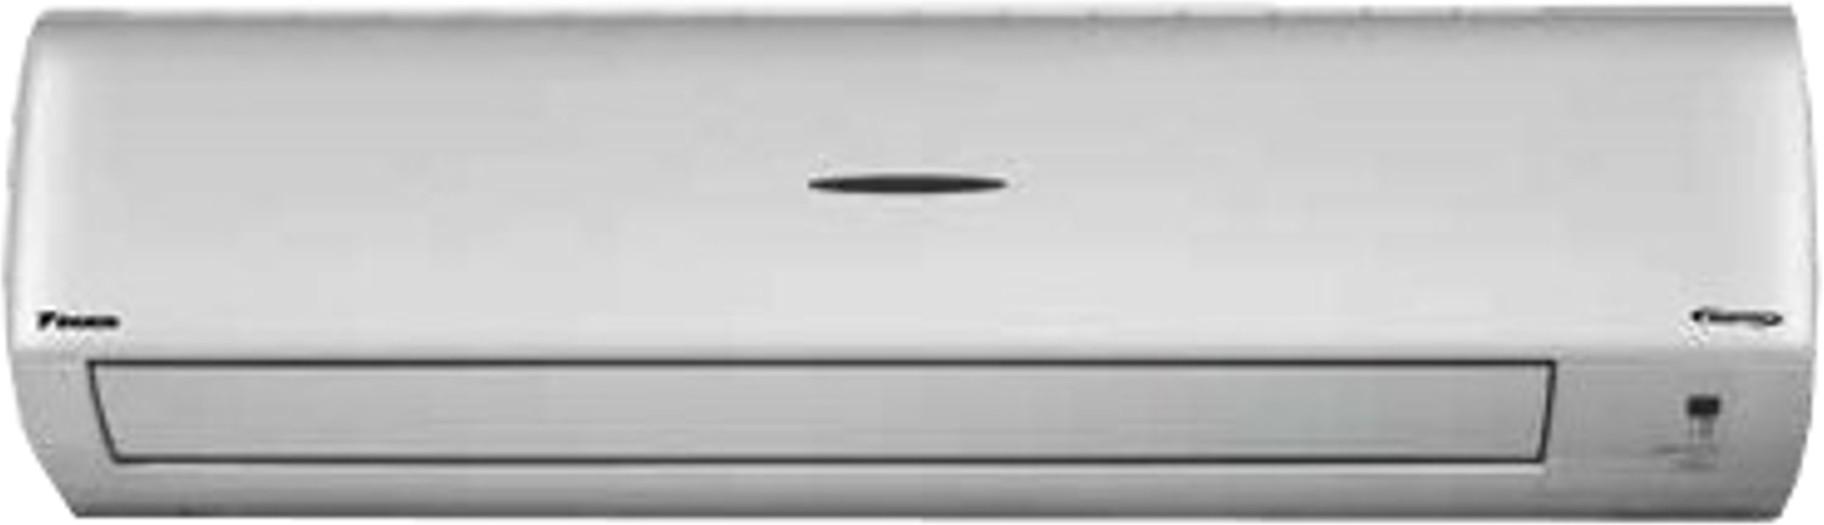 Daikin FTKH50RRV 1.5 Ton 3 Star BEE Rating 2017 Inverter AC Image